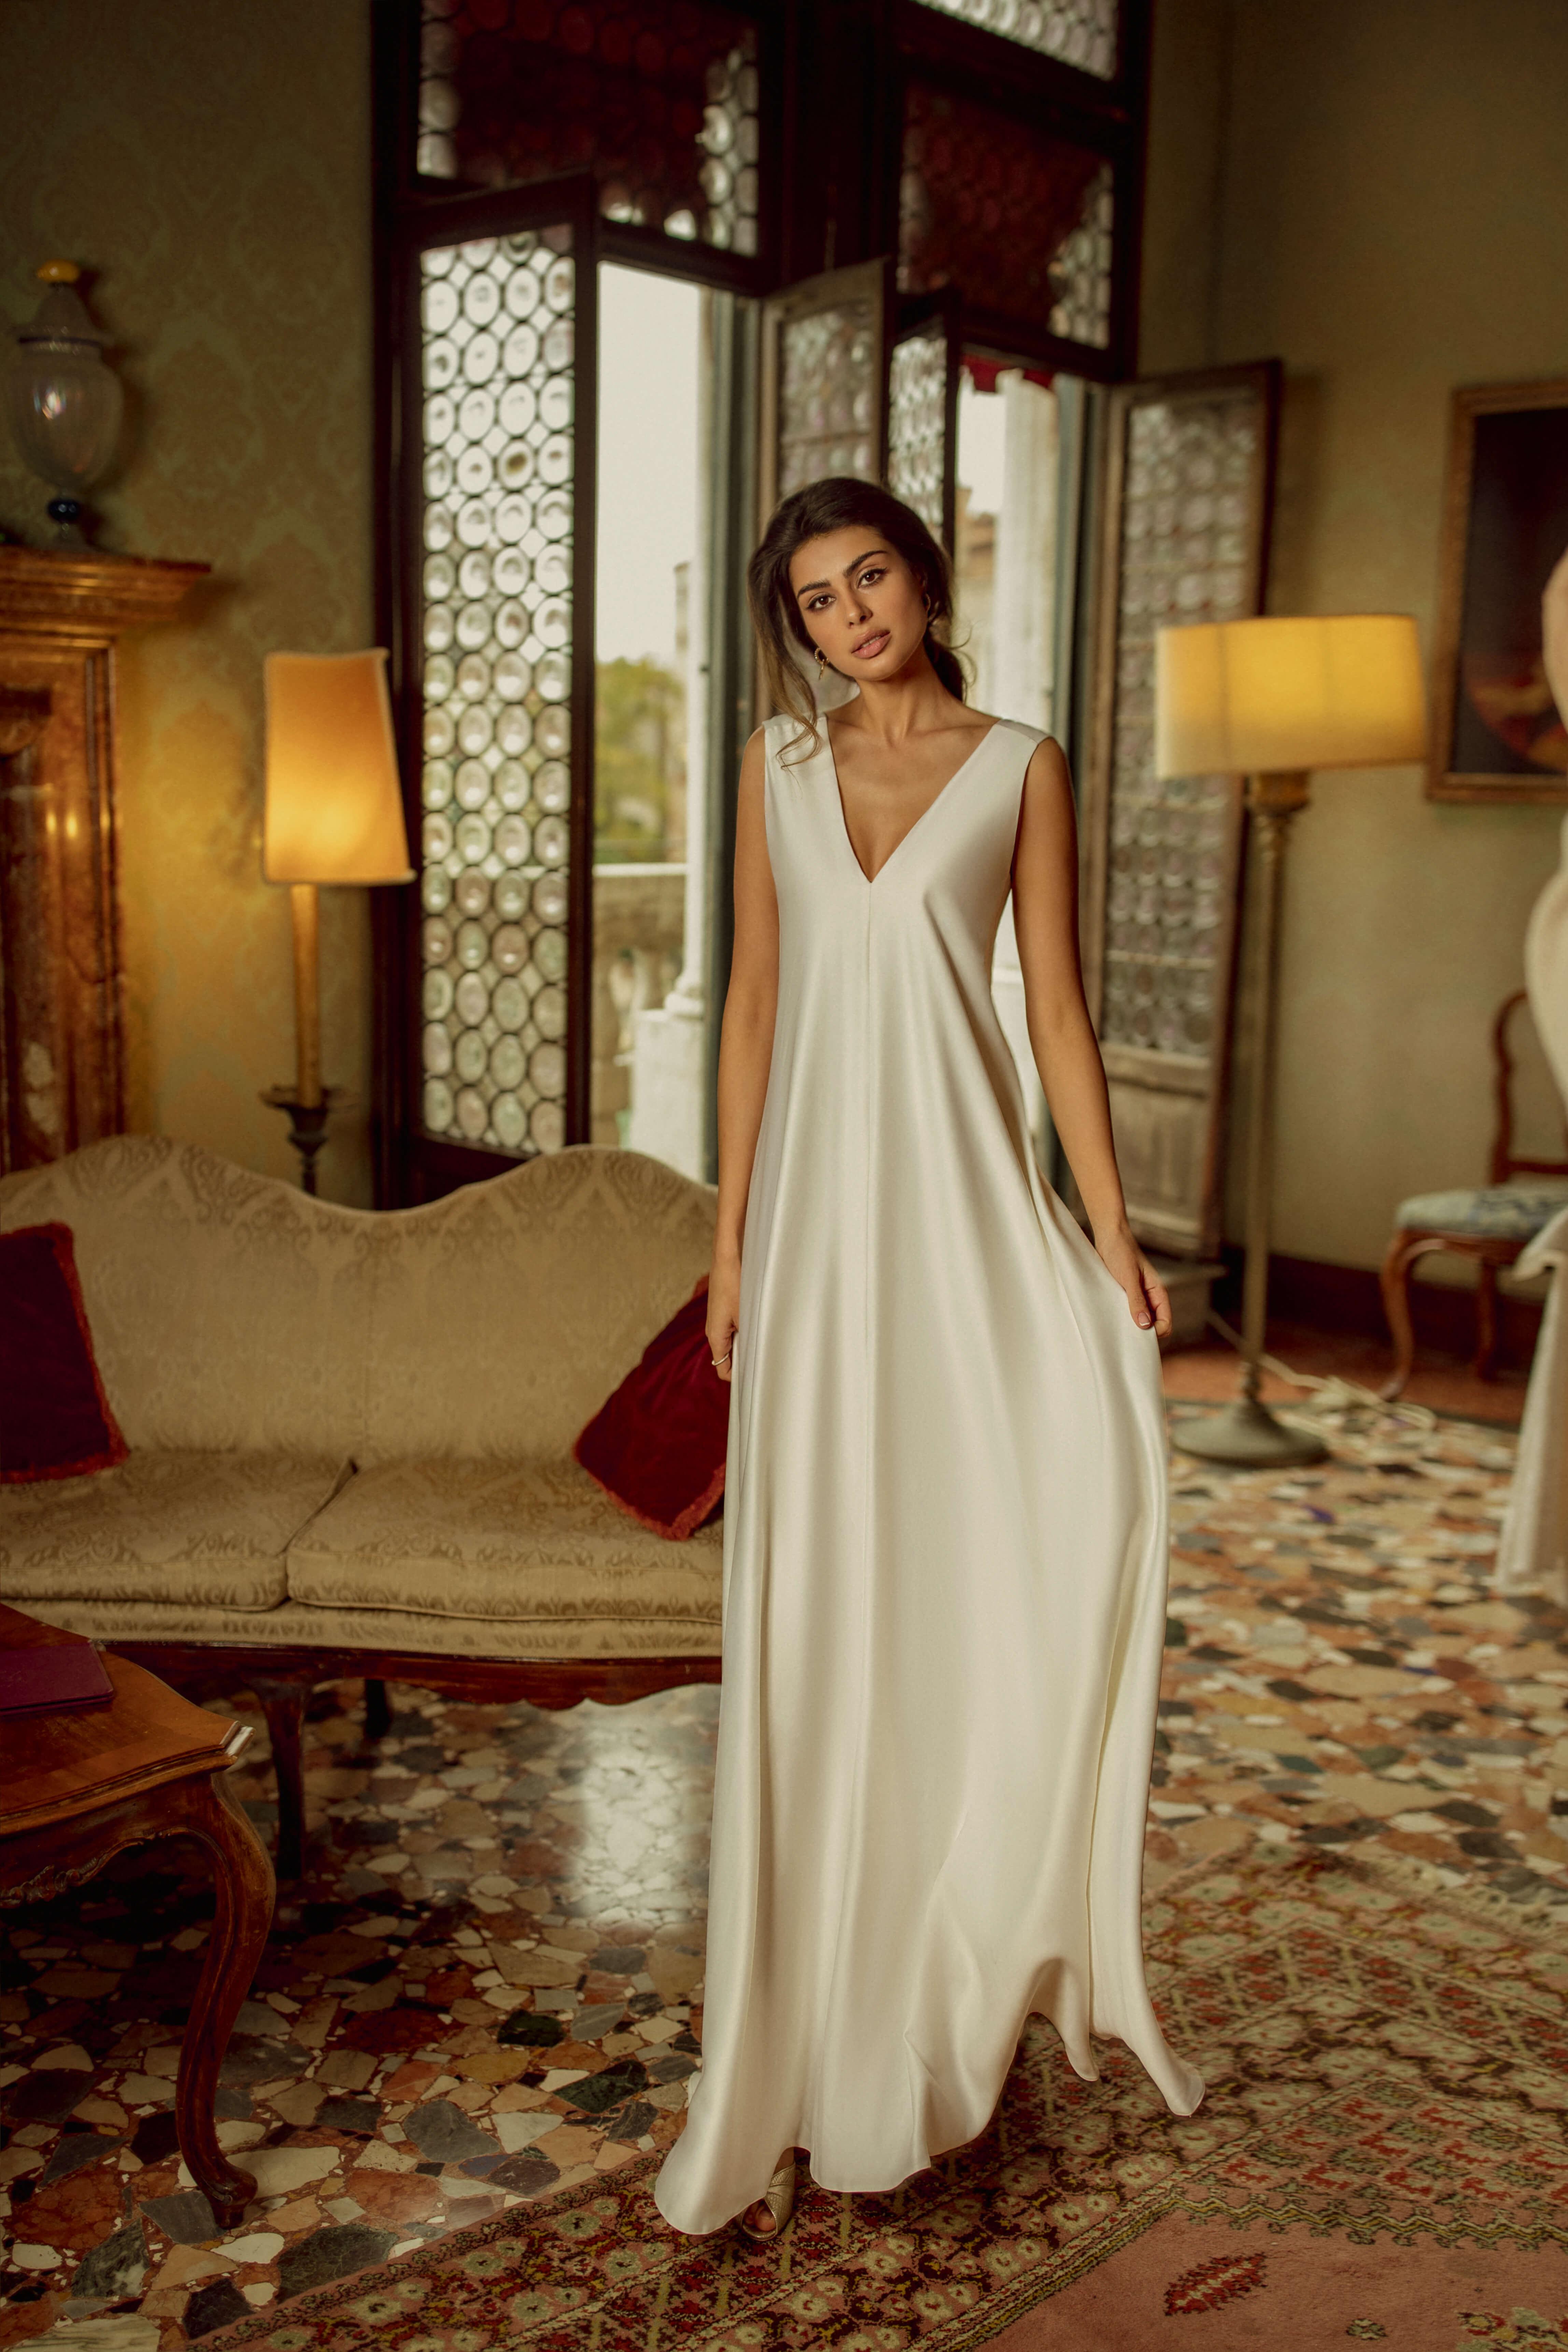 Buy a wedding dress from Rara Avis in Kiev